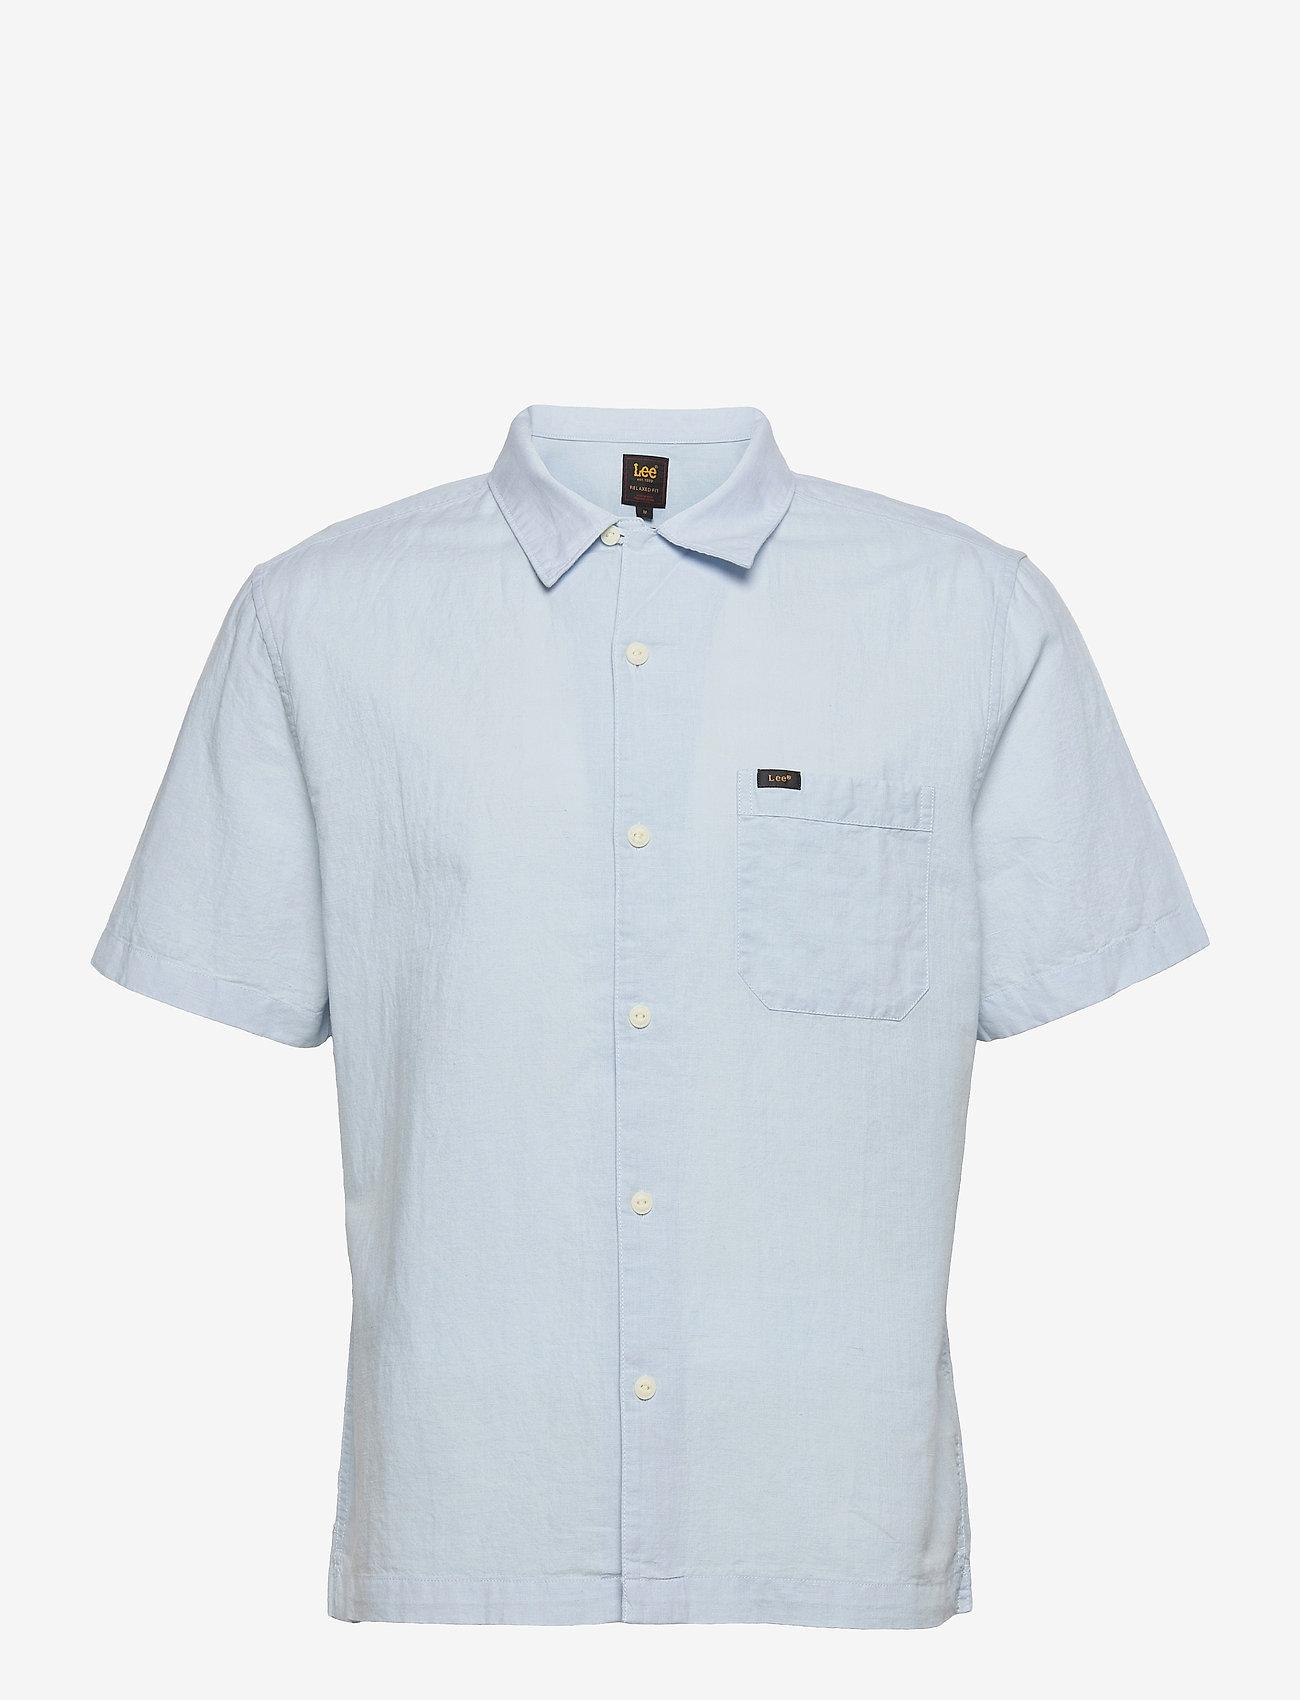 Lee Jeans - SS RESORT SHIRT - basic shirts - skyway blue - 0